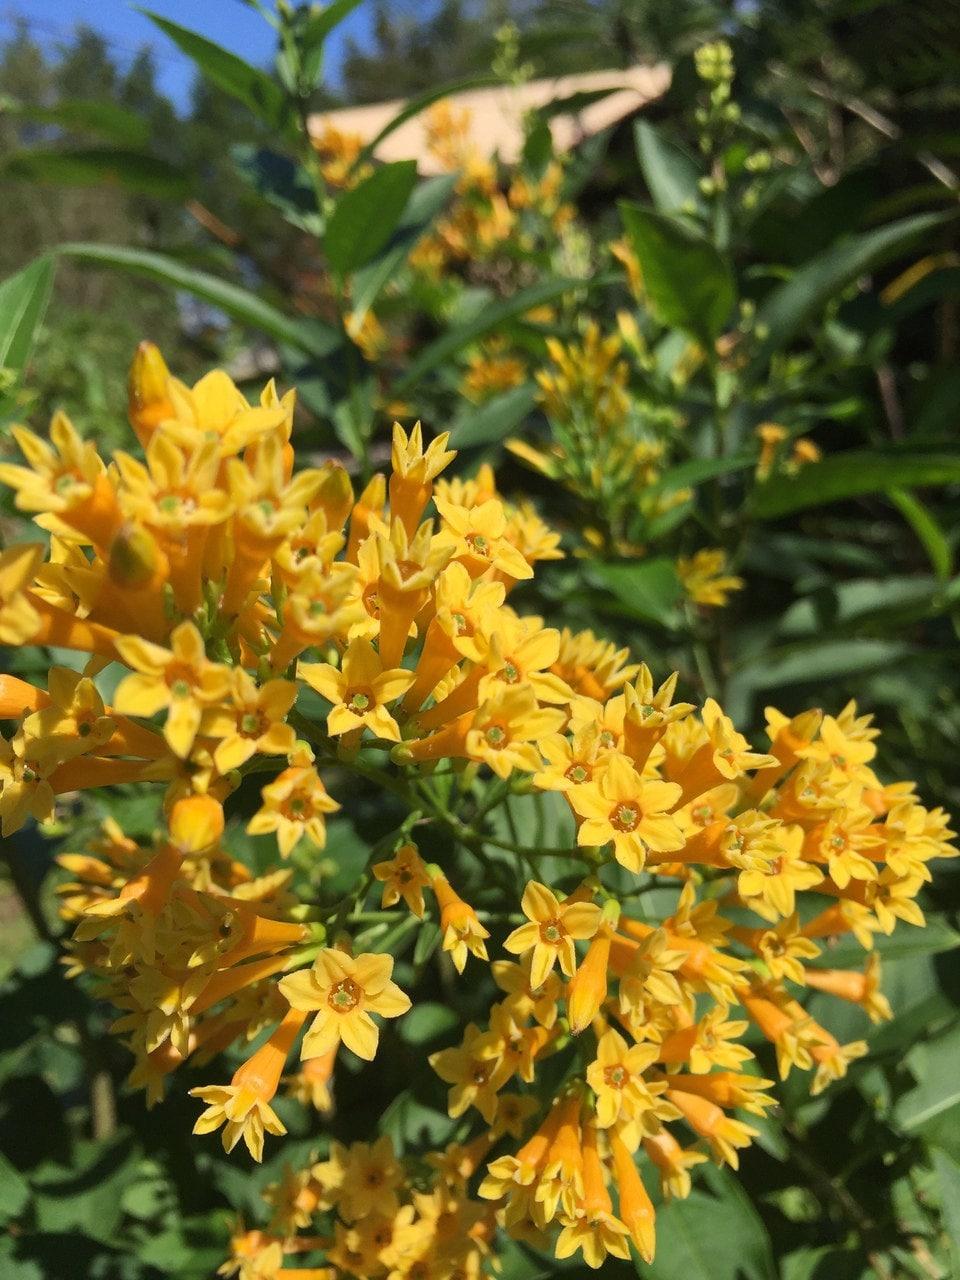 7 Night Blooming Yellow Jasmine Seeds 1343 Etsy